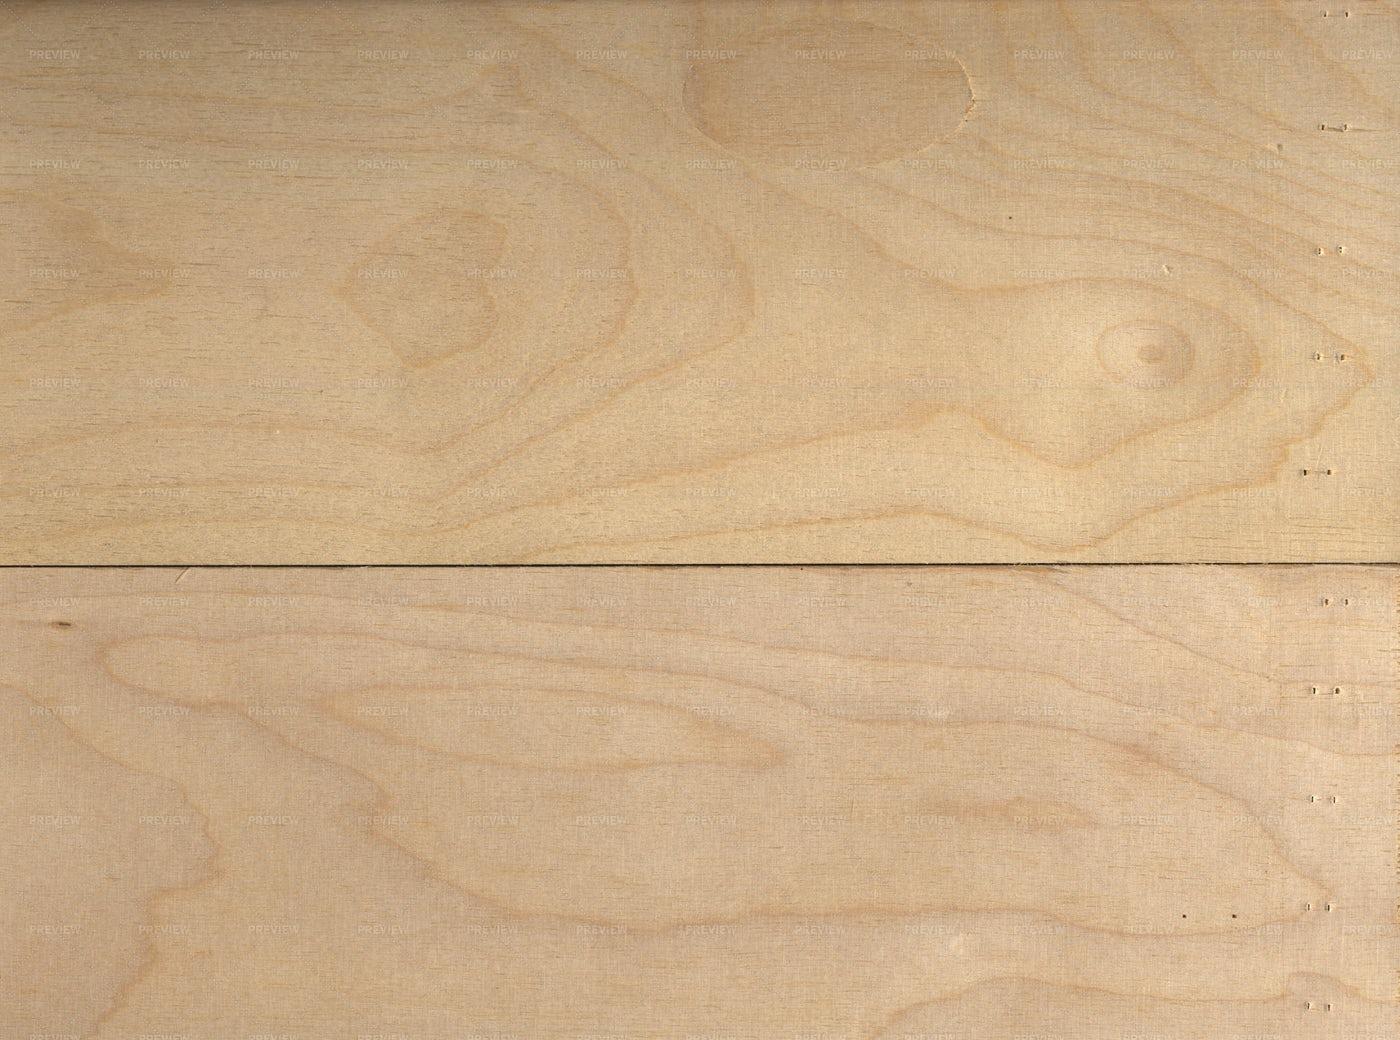 Light Brown Wooden Texture: Stock Photos